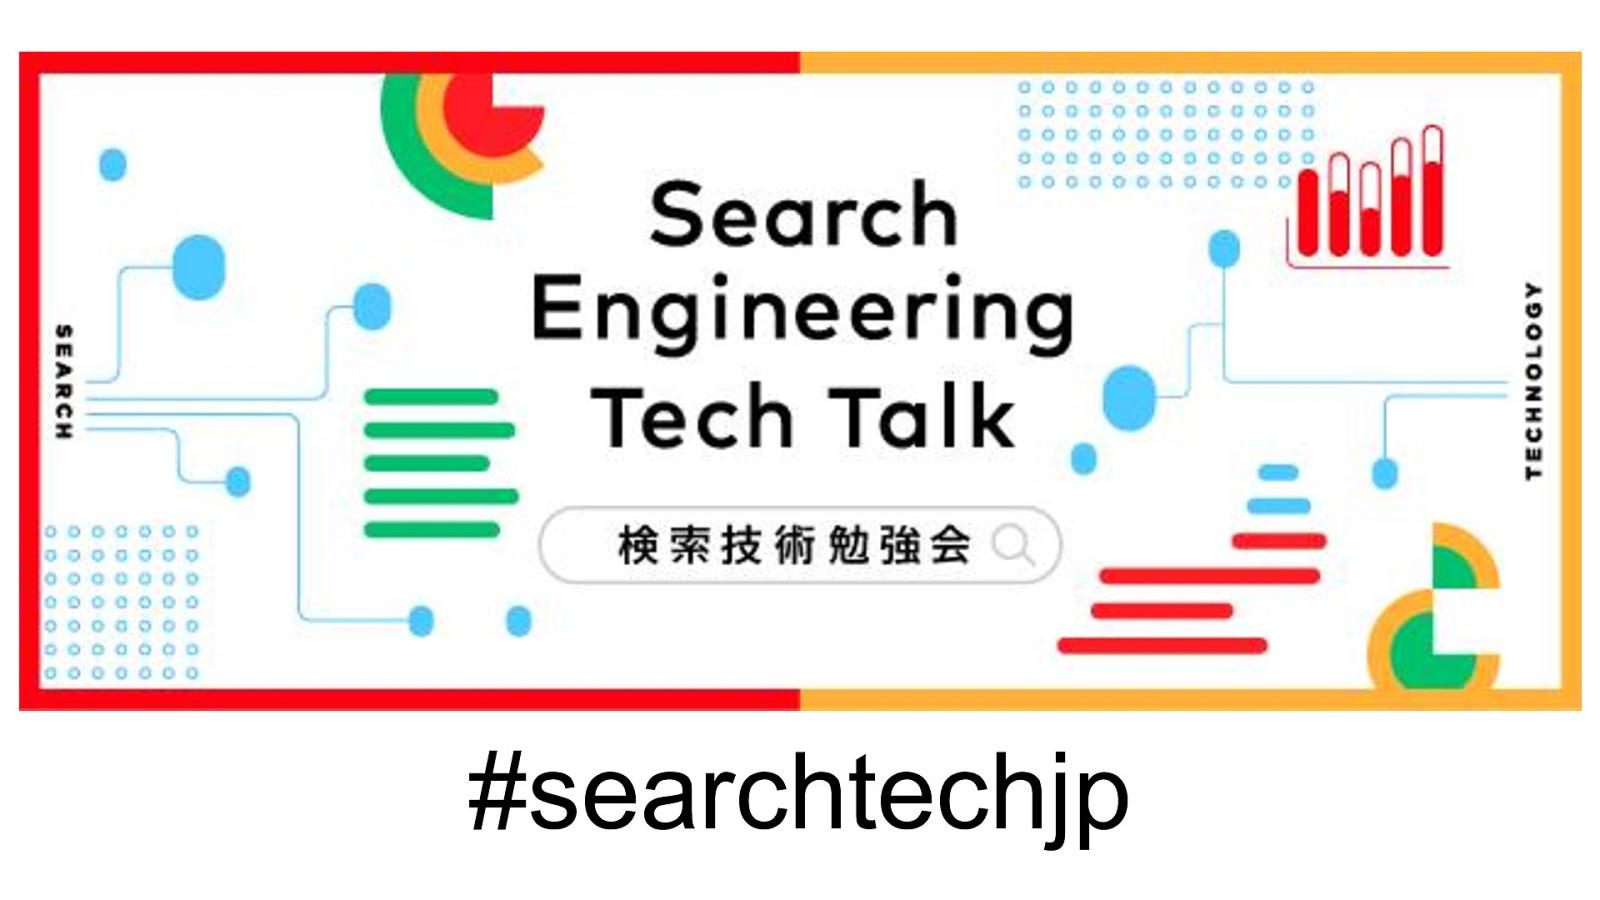 Search Engineering Tech Talk オープニング